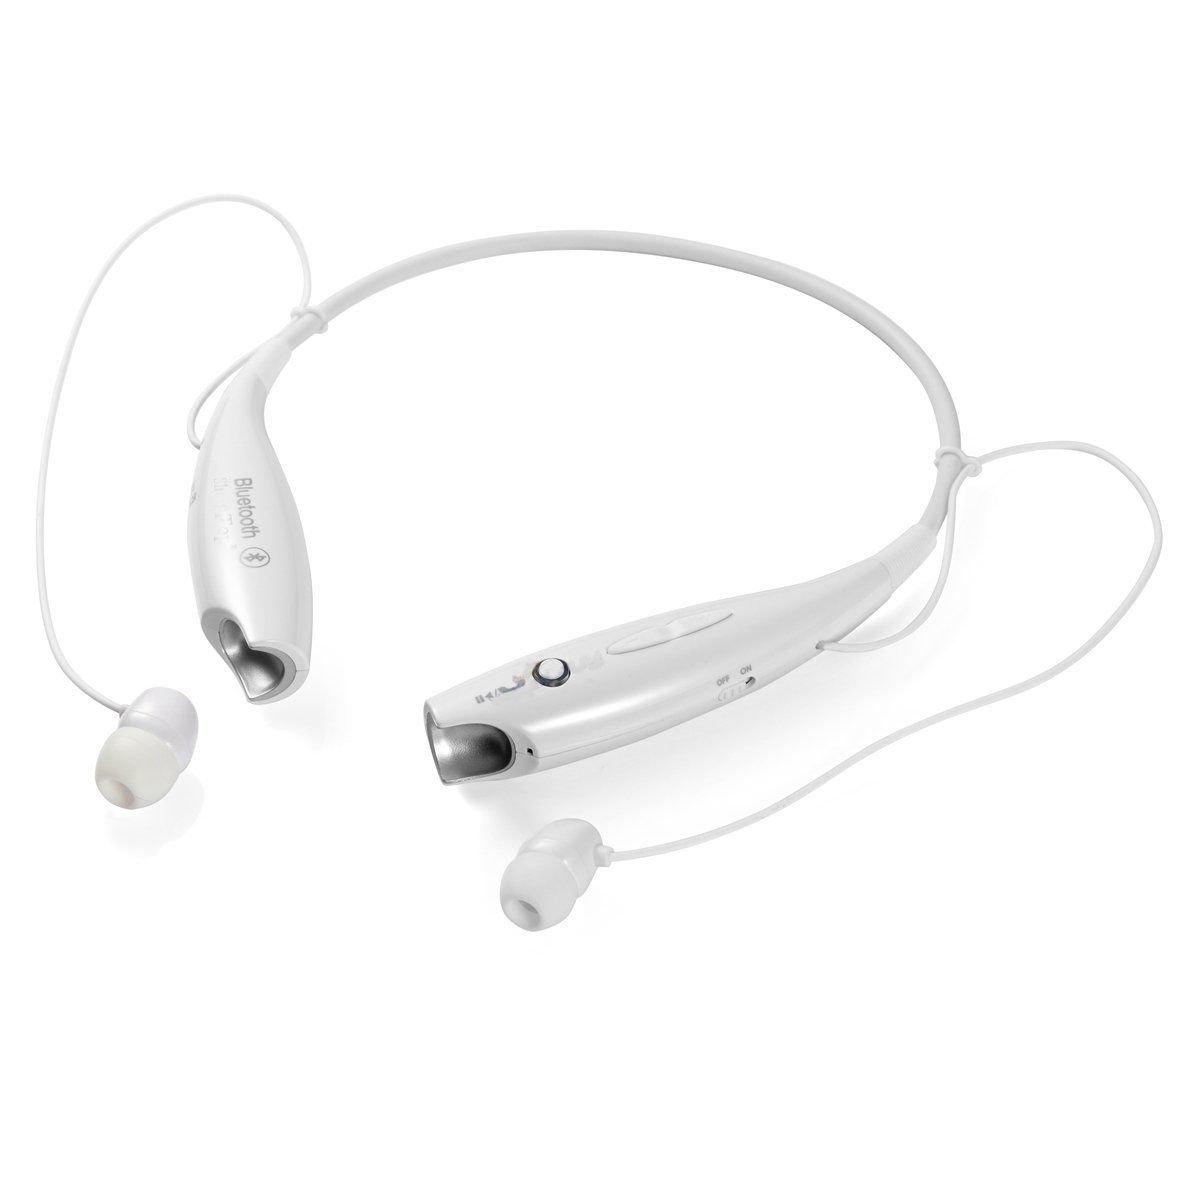 e67558ec8c8 Amazon.com  FastSun Bluetooth Wireless Headset Stereo Headphone Earphone  Sport Handfree Universal (White)  Cell Phones   Accessories